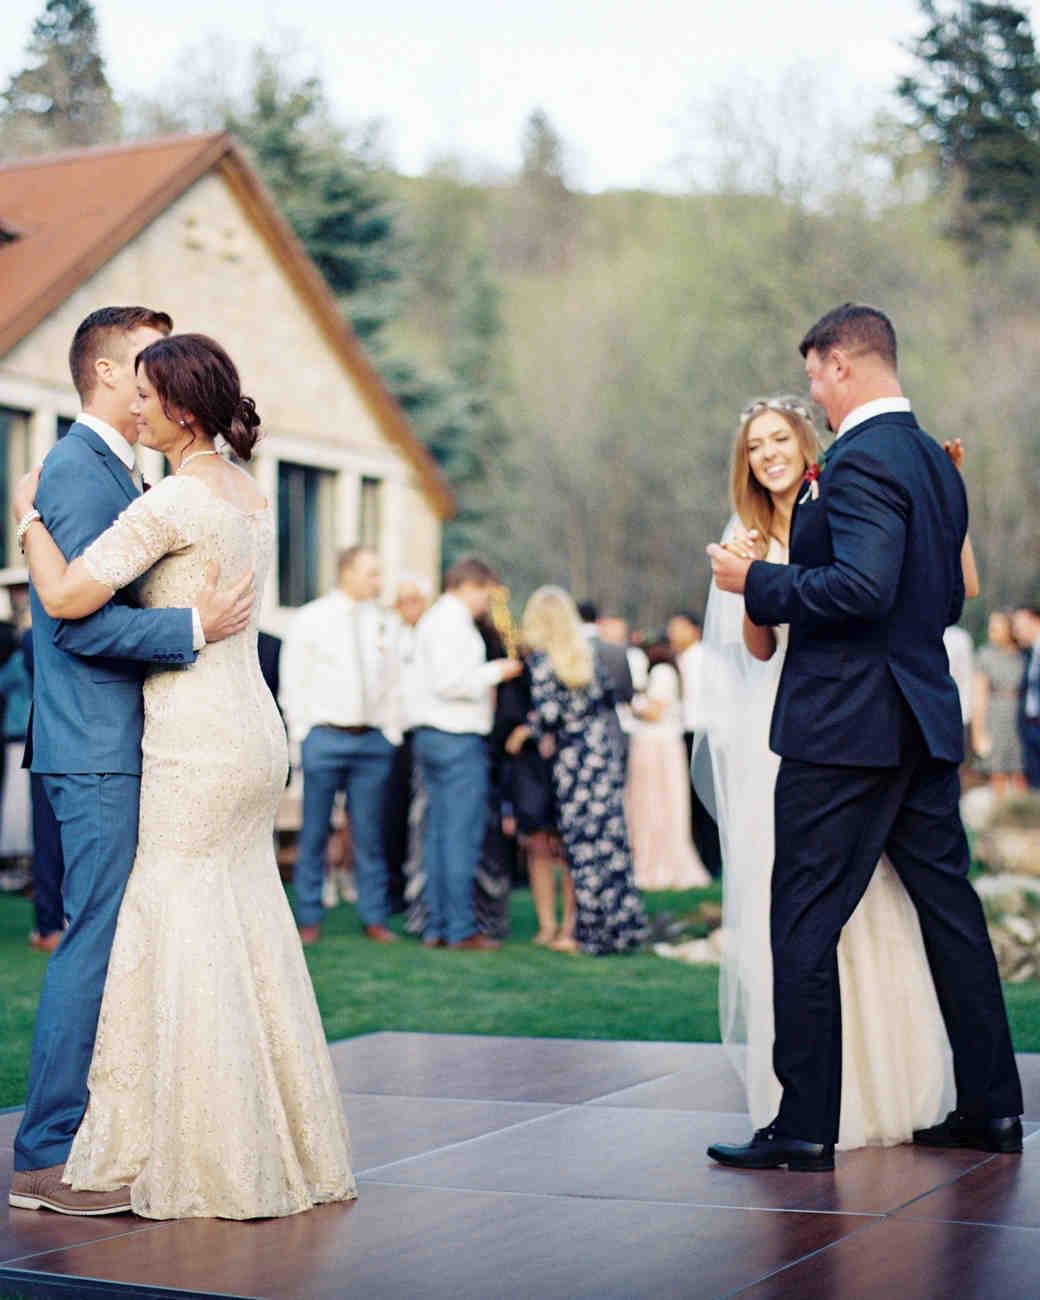 ciera preston wedding parent dance